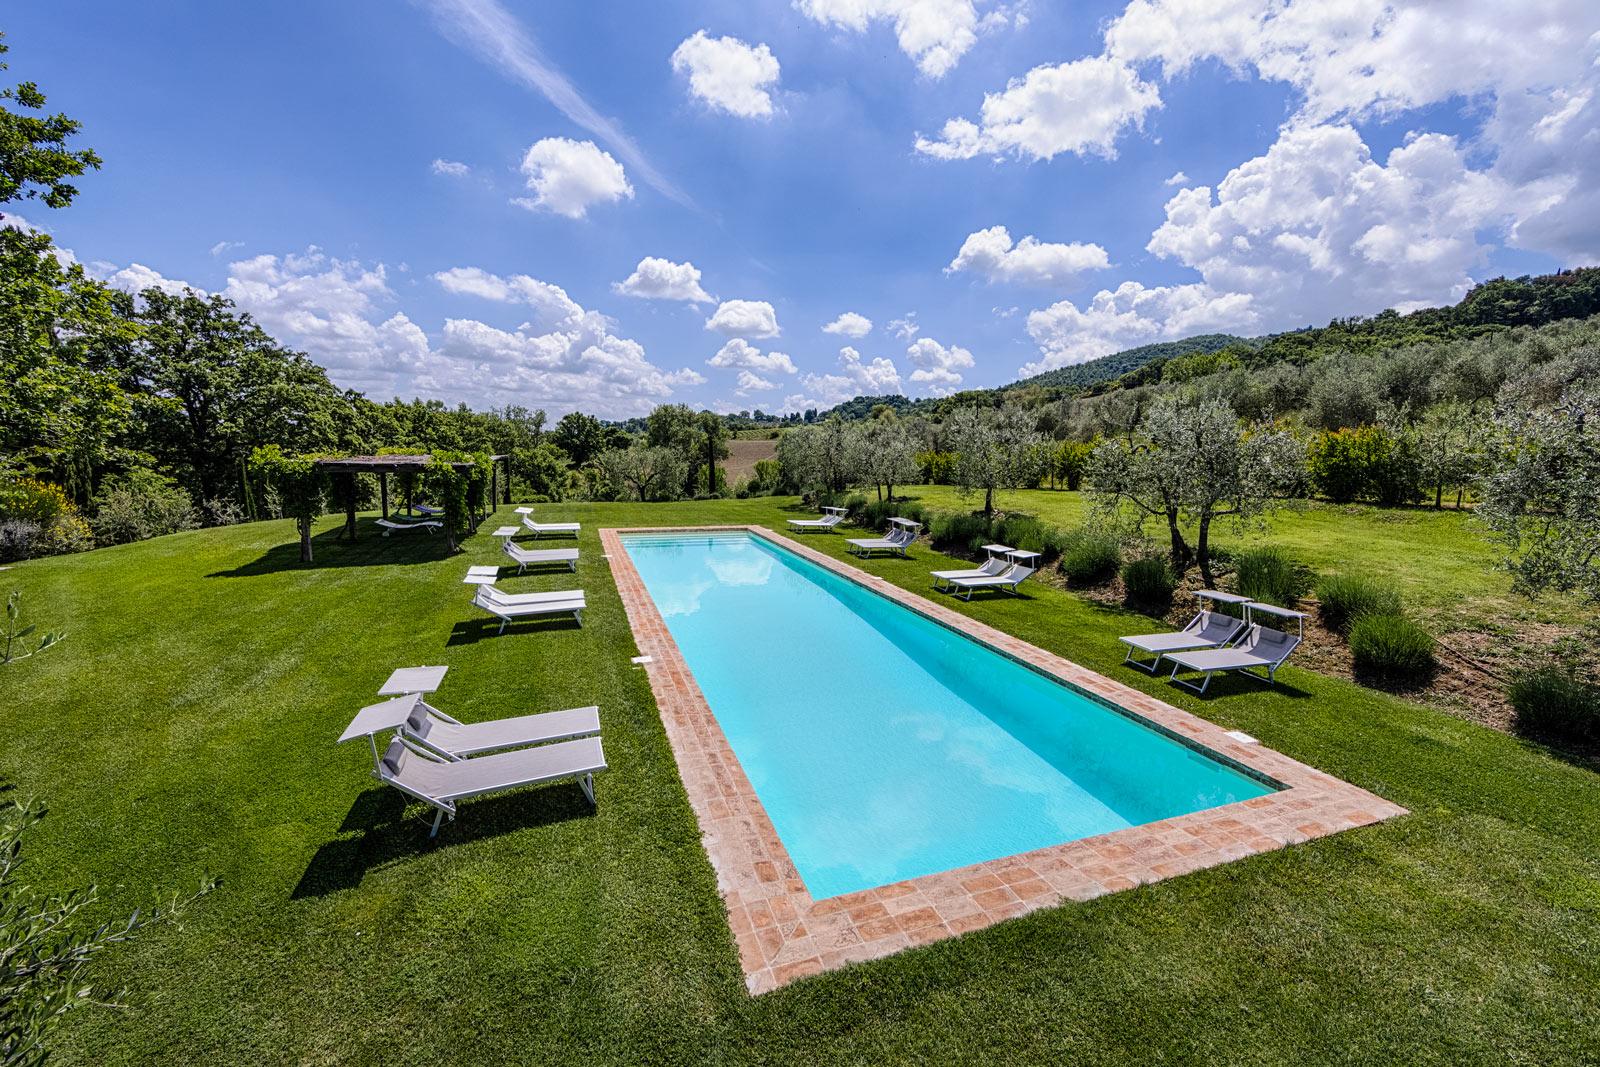 Agriturismo di lusso con piscina casa fabbrini val d 39 orcia agriturismo toscana - Agriturismo con piscina toscana ...